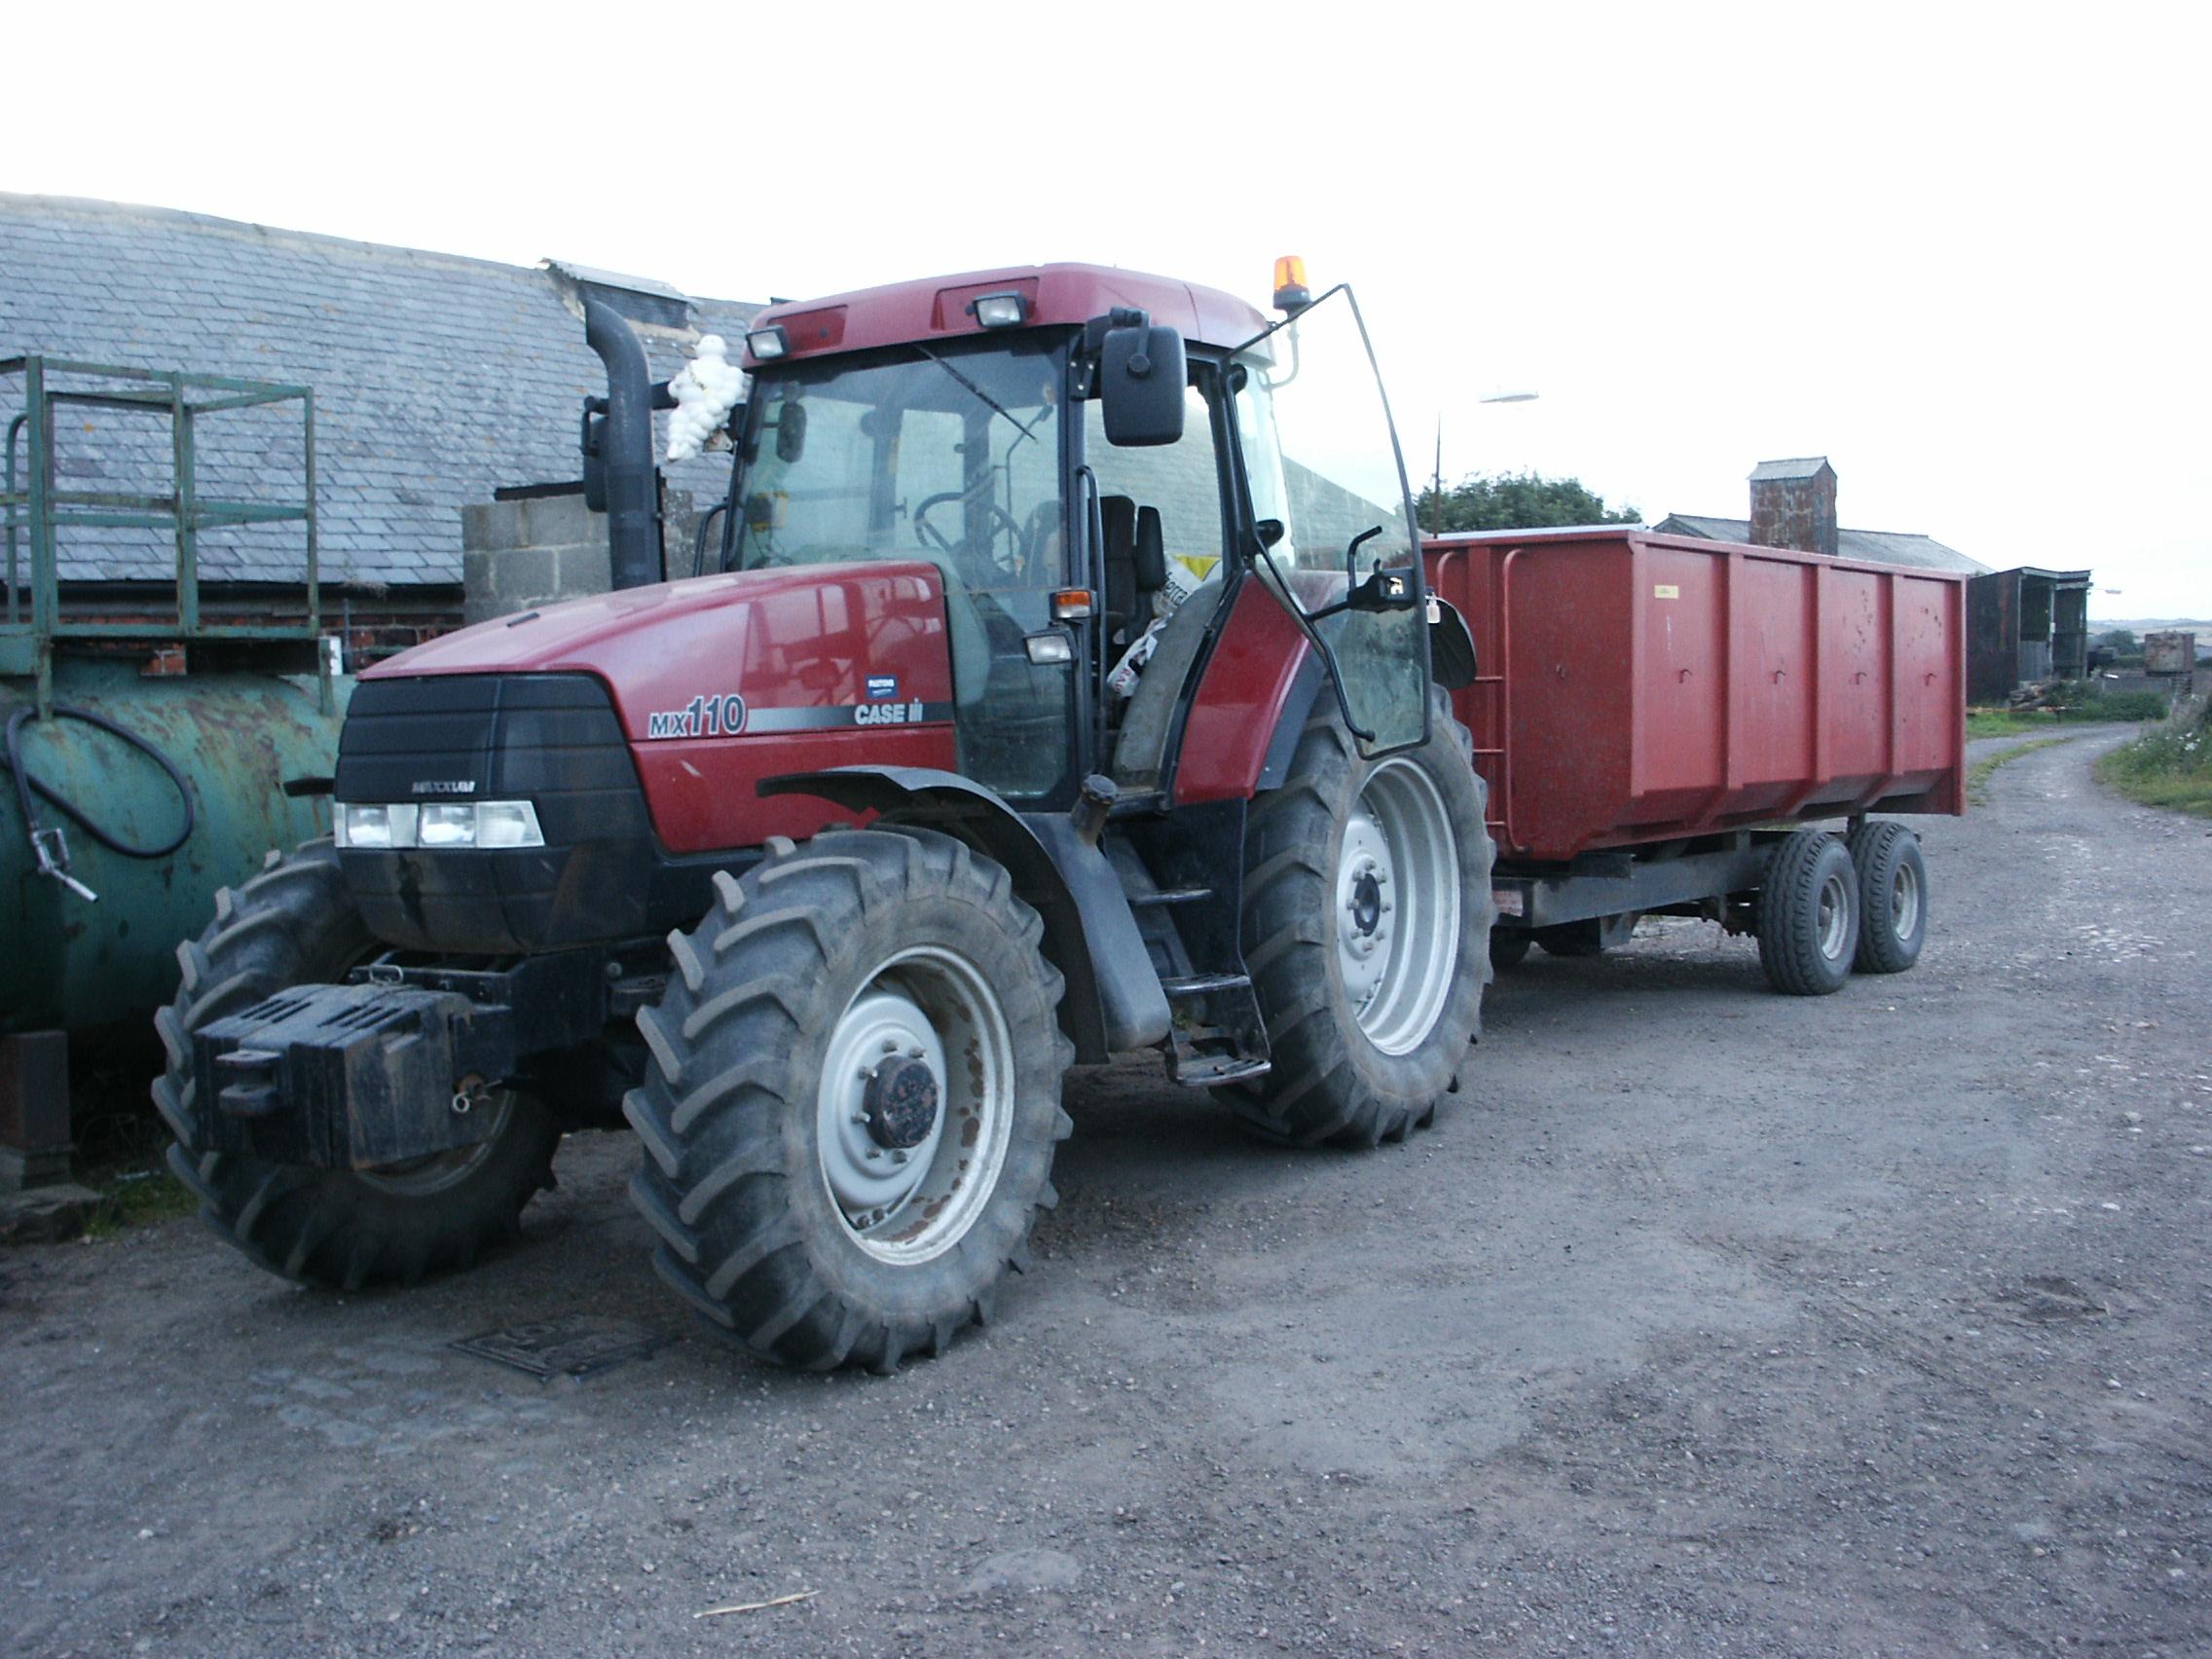 Case Tractor Mx110 : File case mx maxxum with trailer g wikimedia commons